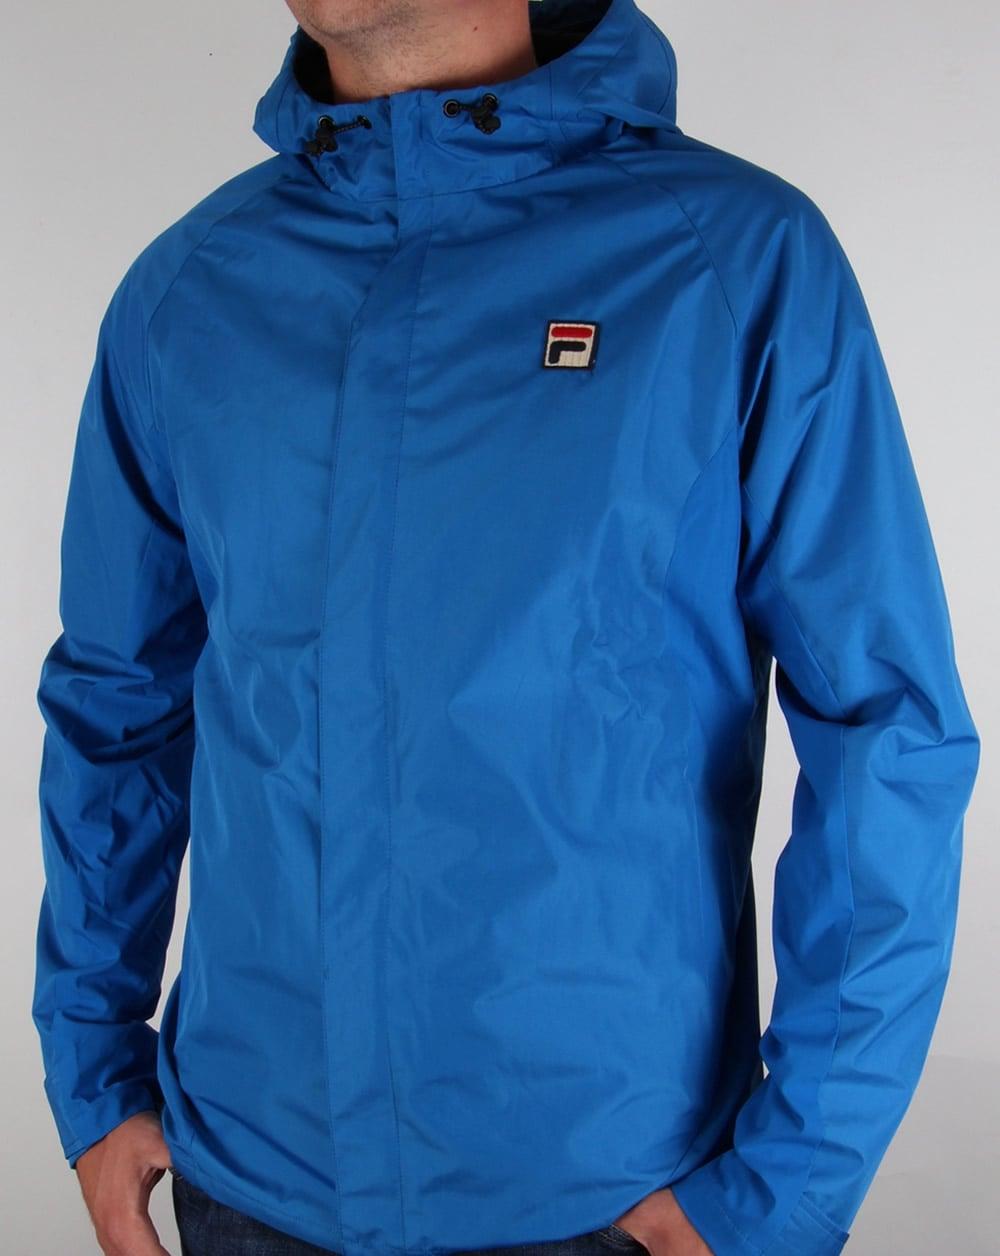 fila jacket blue